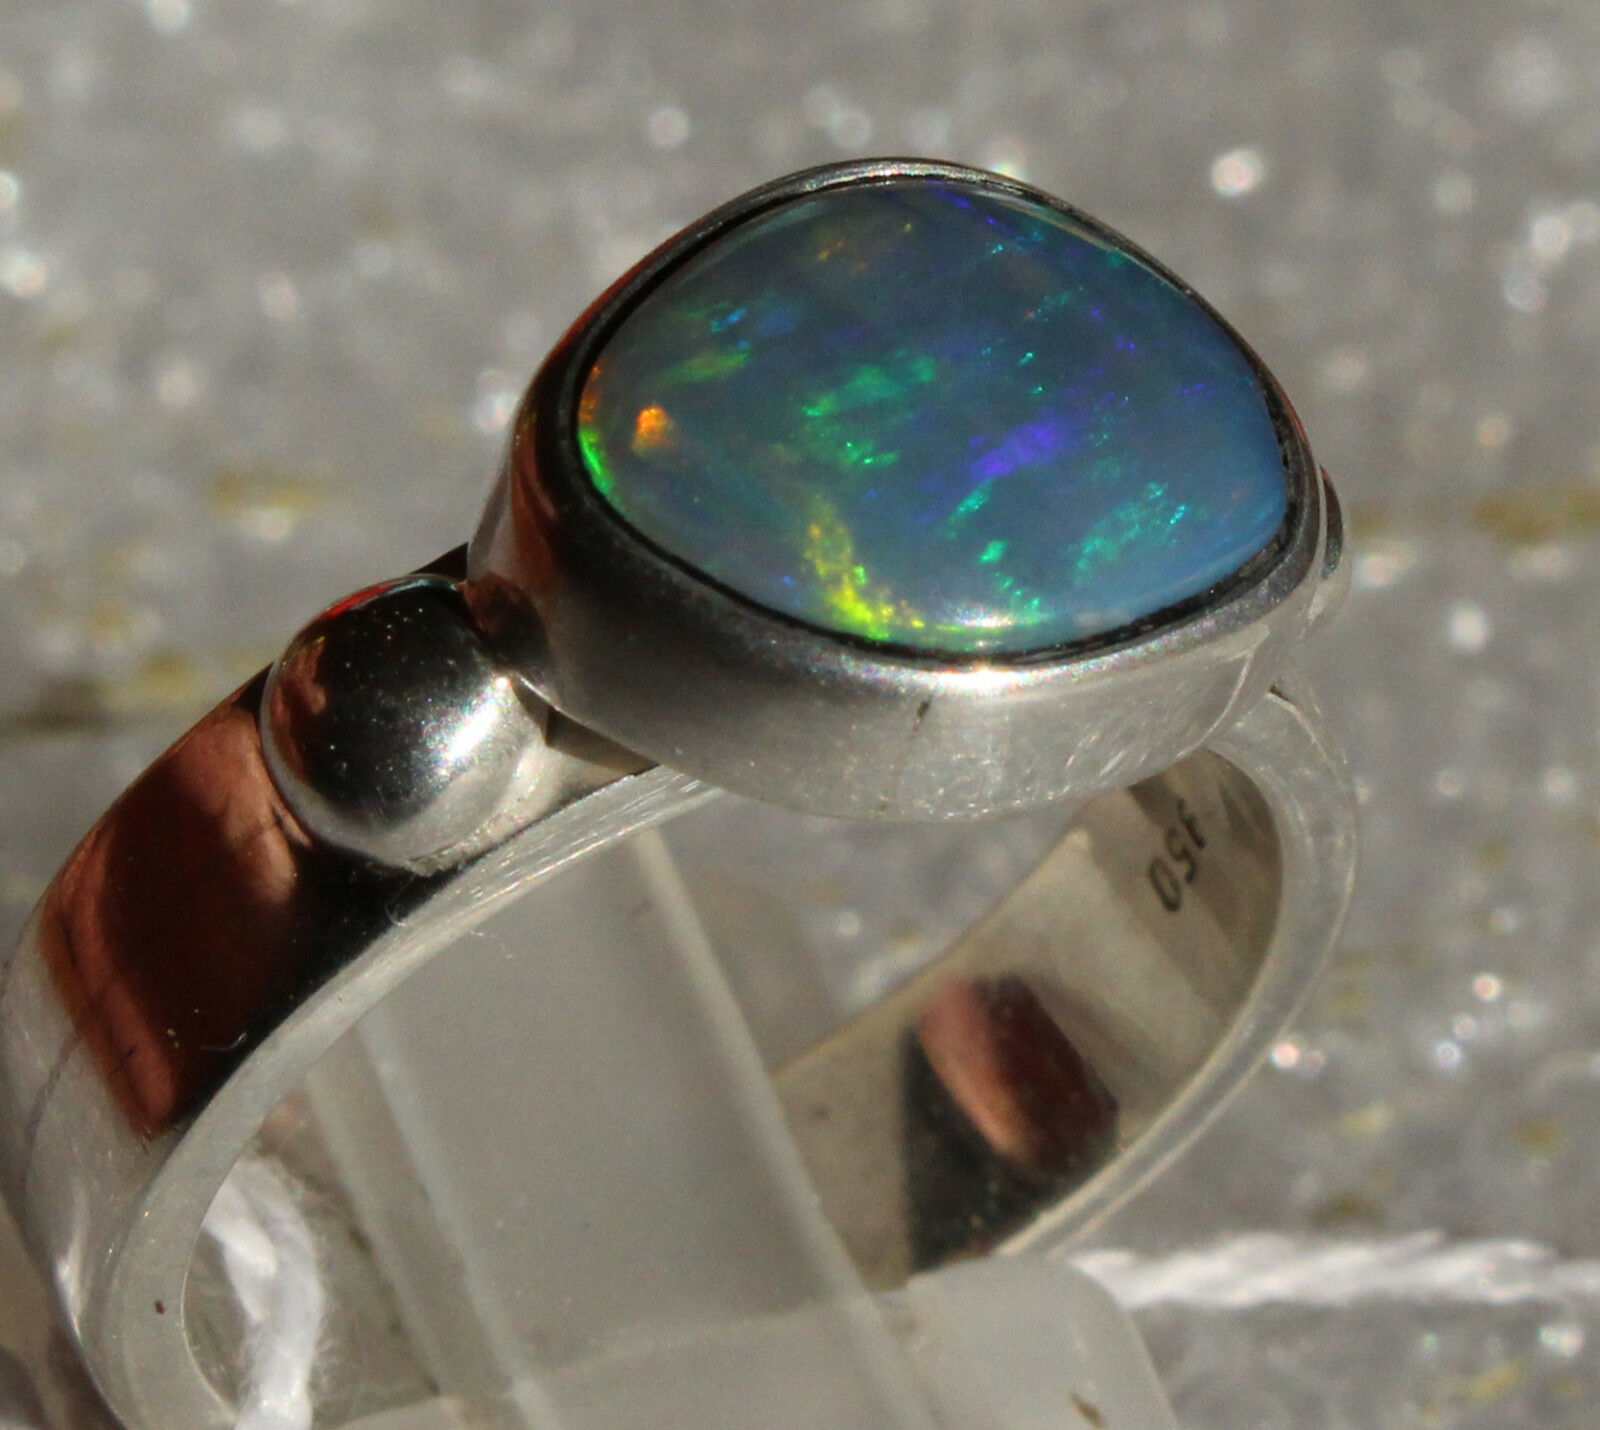 Brazil Crystal Opal 2.2 Karat 950er silverring Größe 18,1 mm